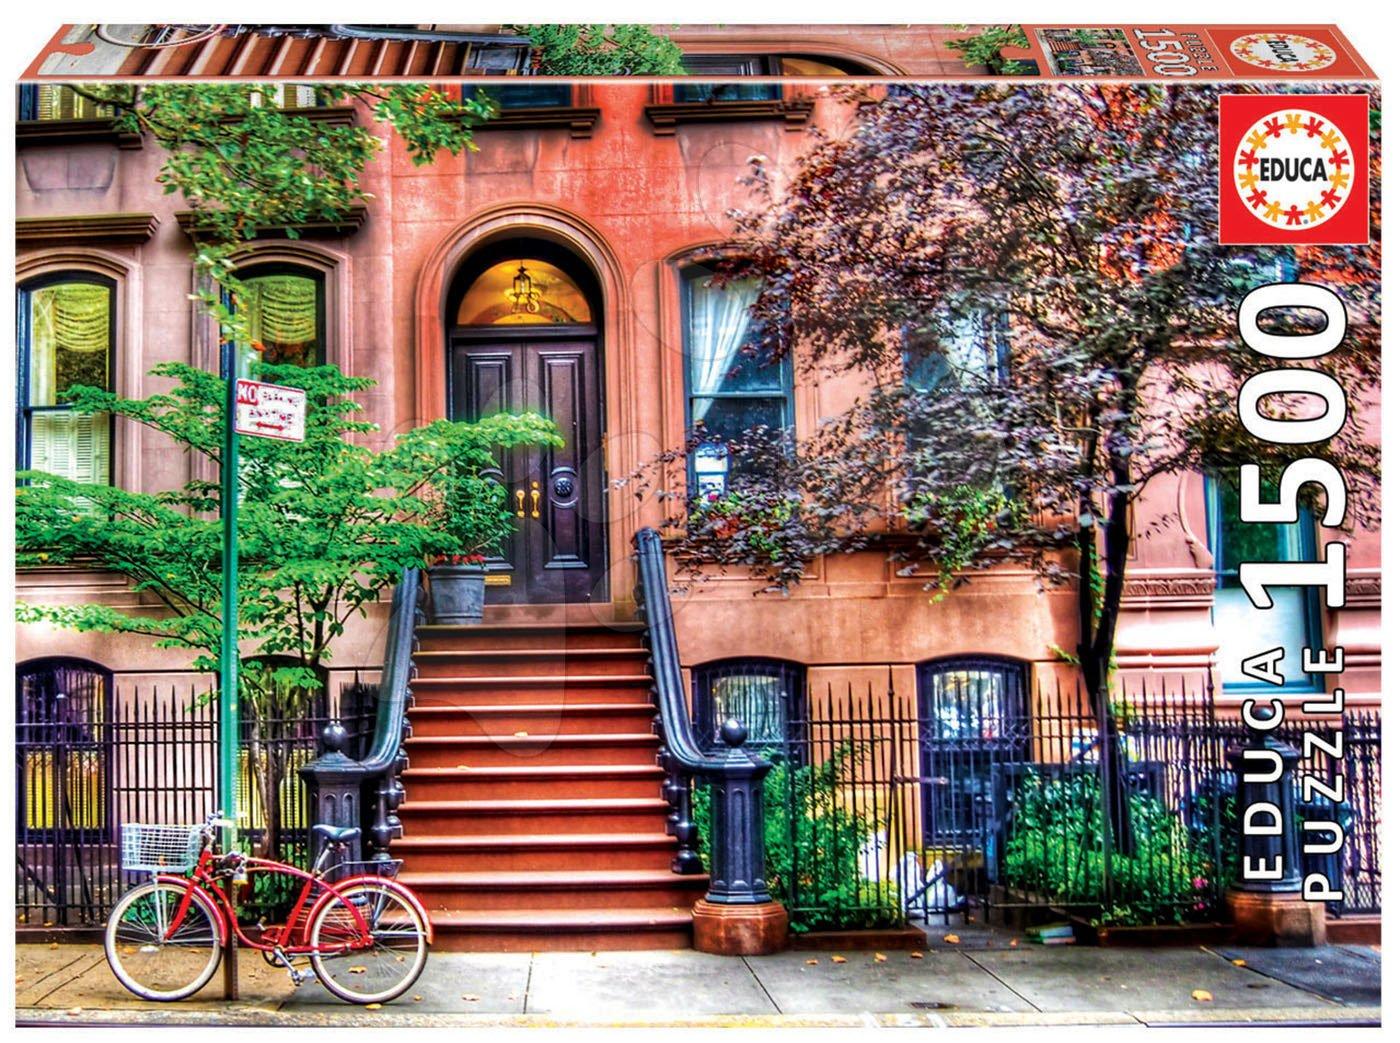 Puzzle Greenwich Village, New York Educa 1500 dílků a Fix lepidlo od 11 let